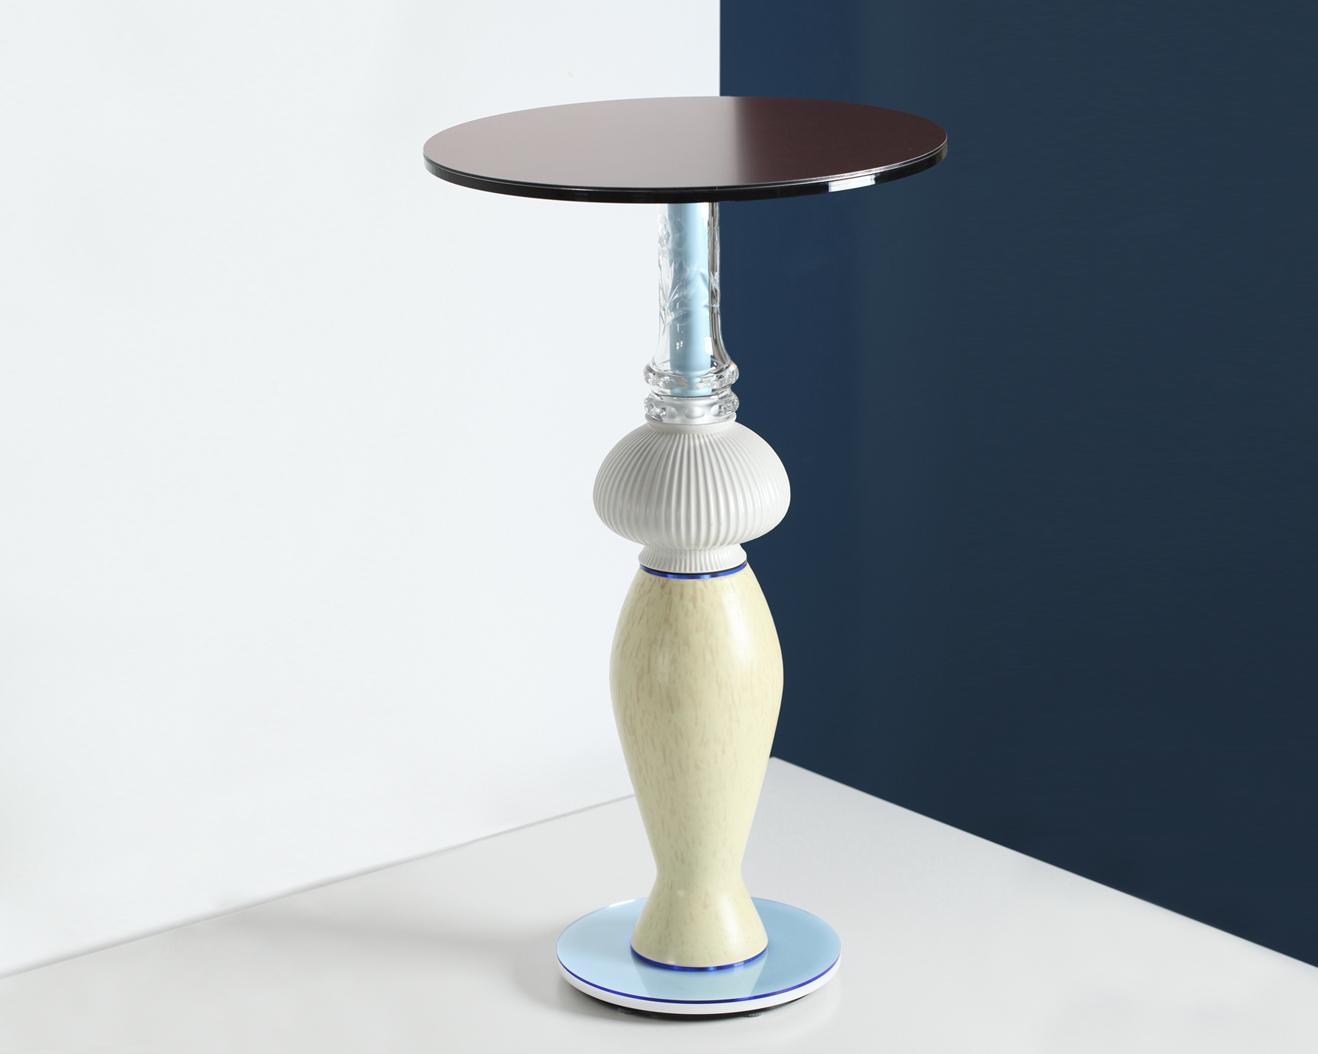 Table; Mobilier; Design; Reçyclage; Galerie;